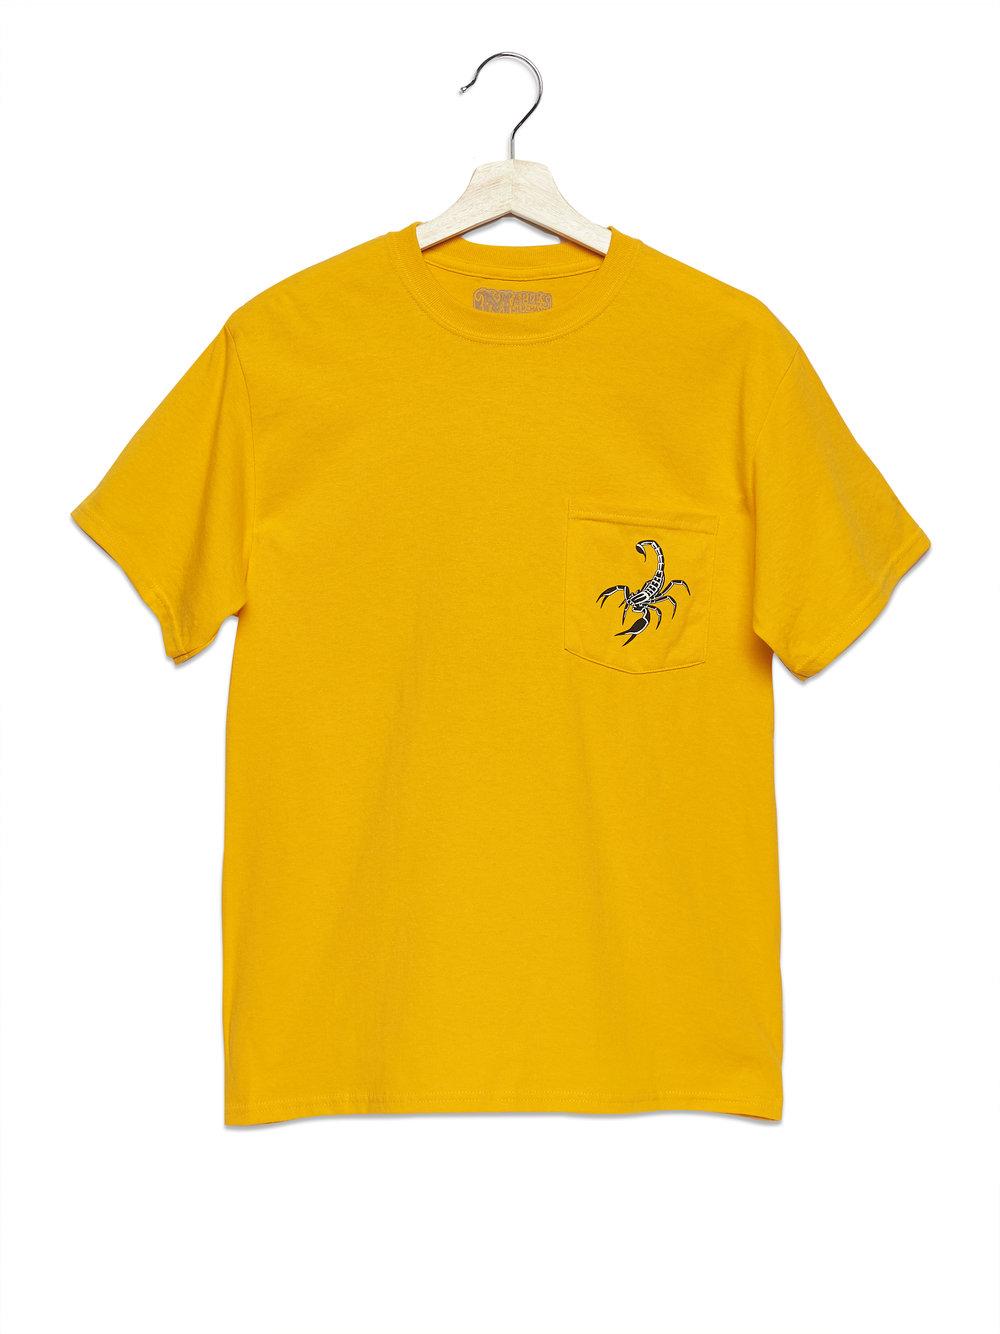 Yellow_ScorptionT_BigCartel_06.jpg